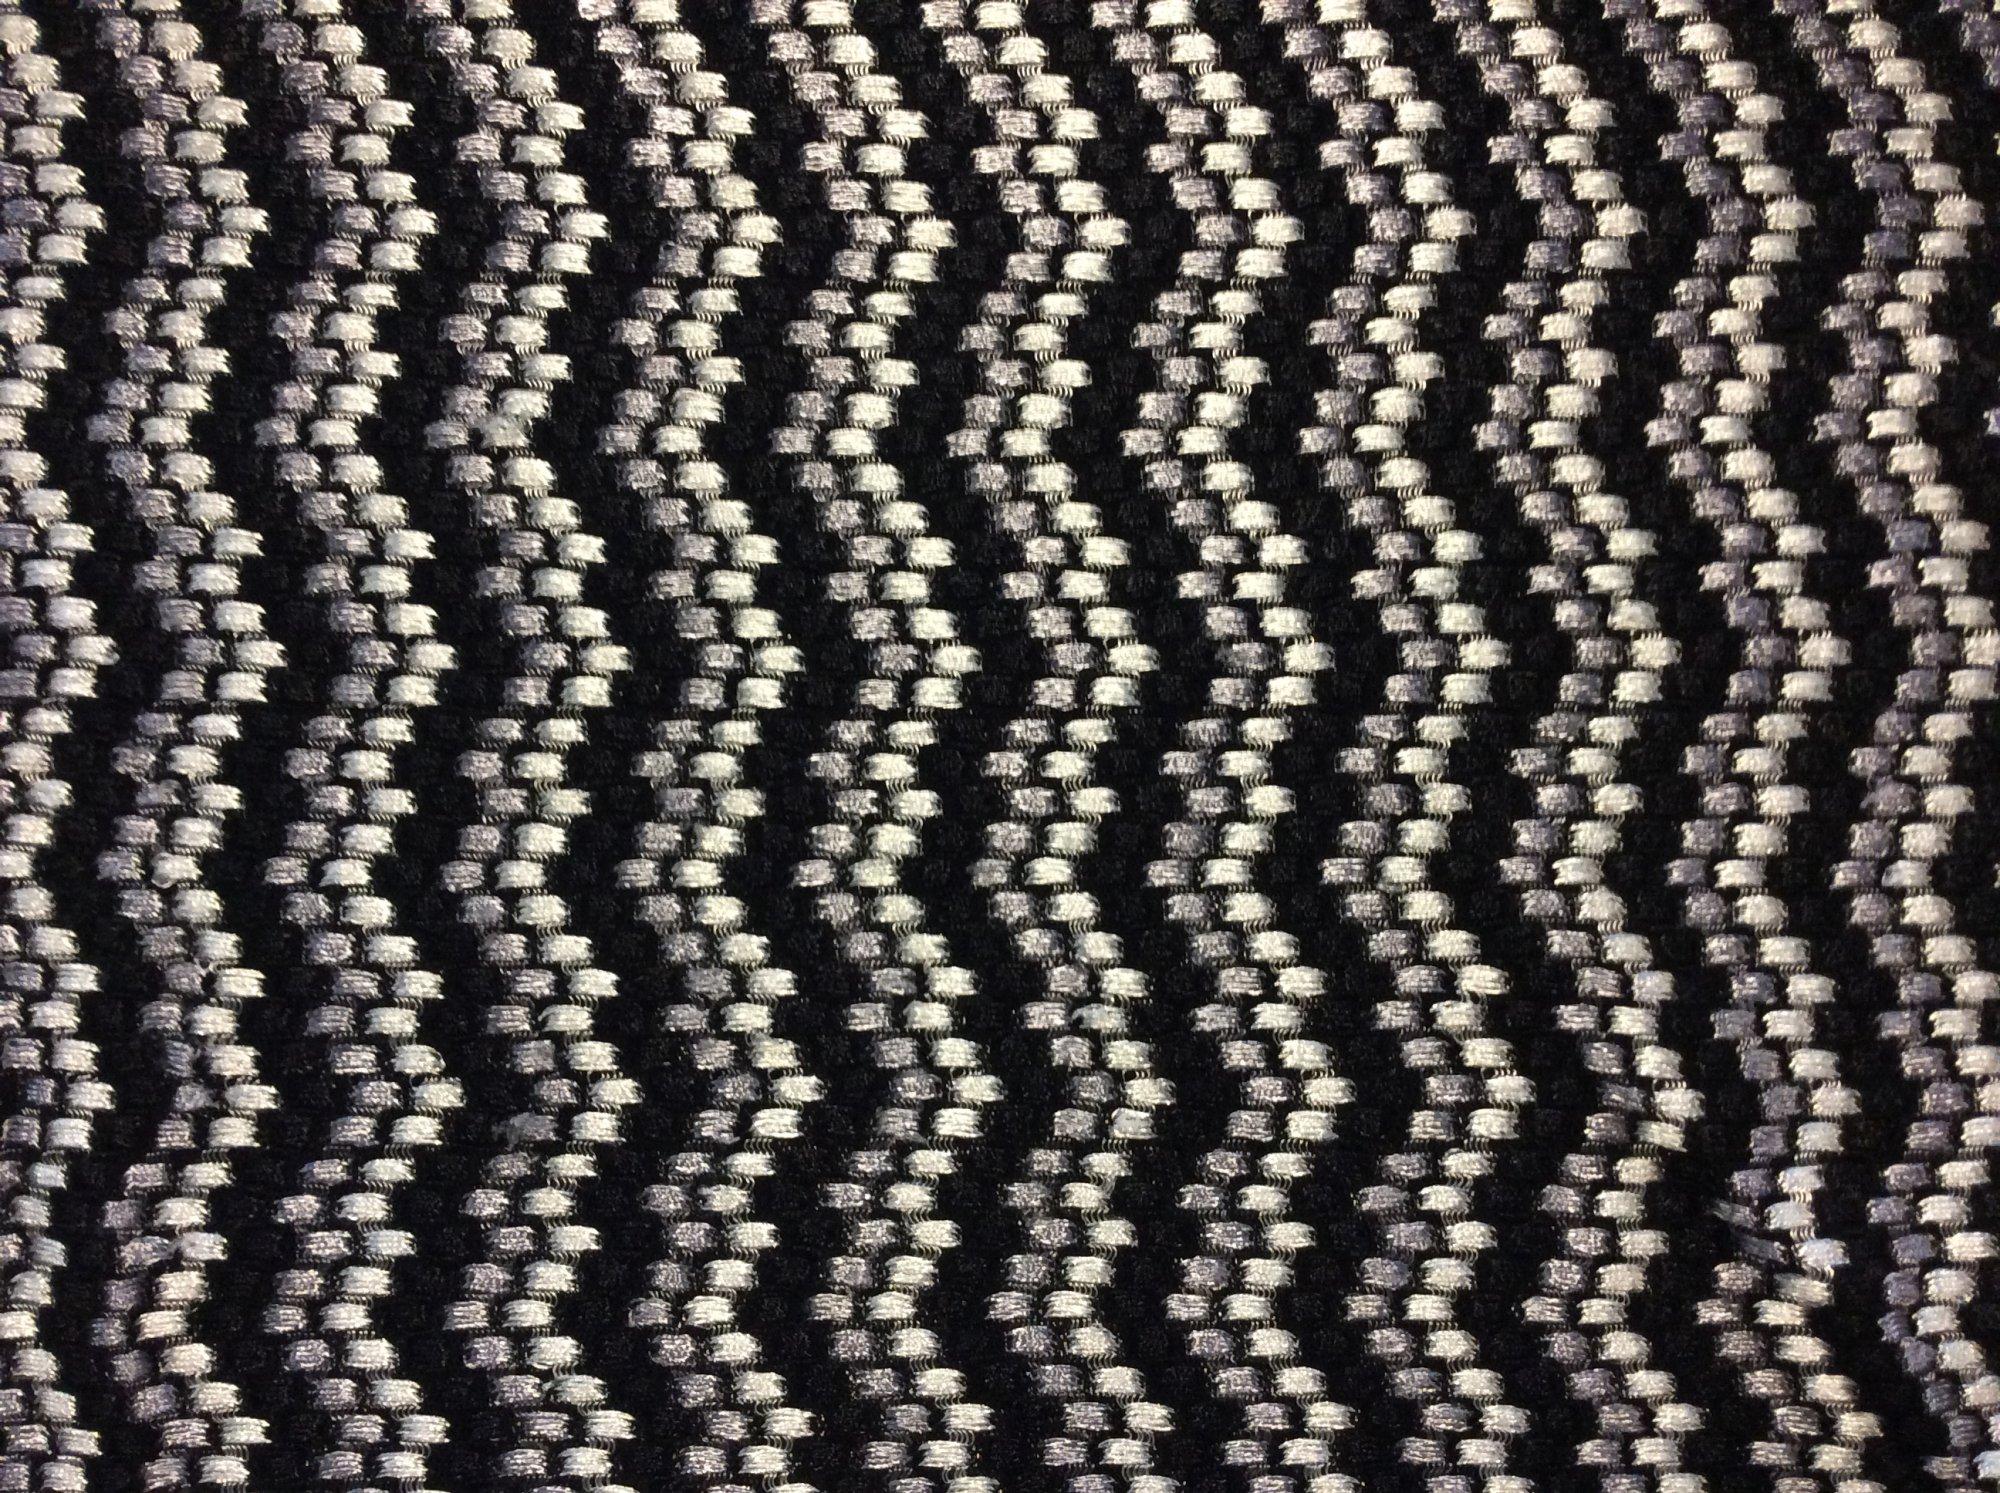 Black Gray and White Silver Knit Stretch Chevron Zig Zag Apparel Dance Fabric RM29